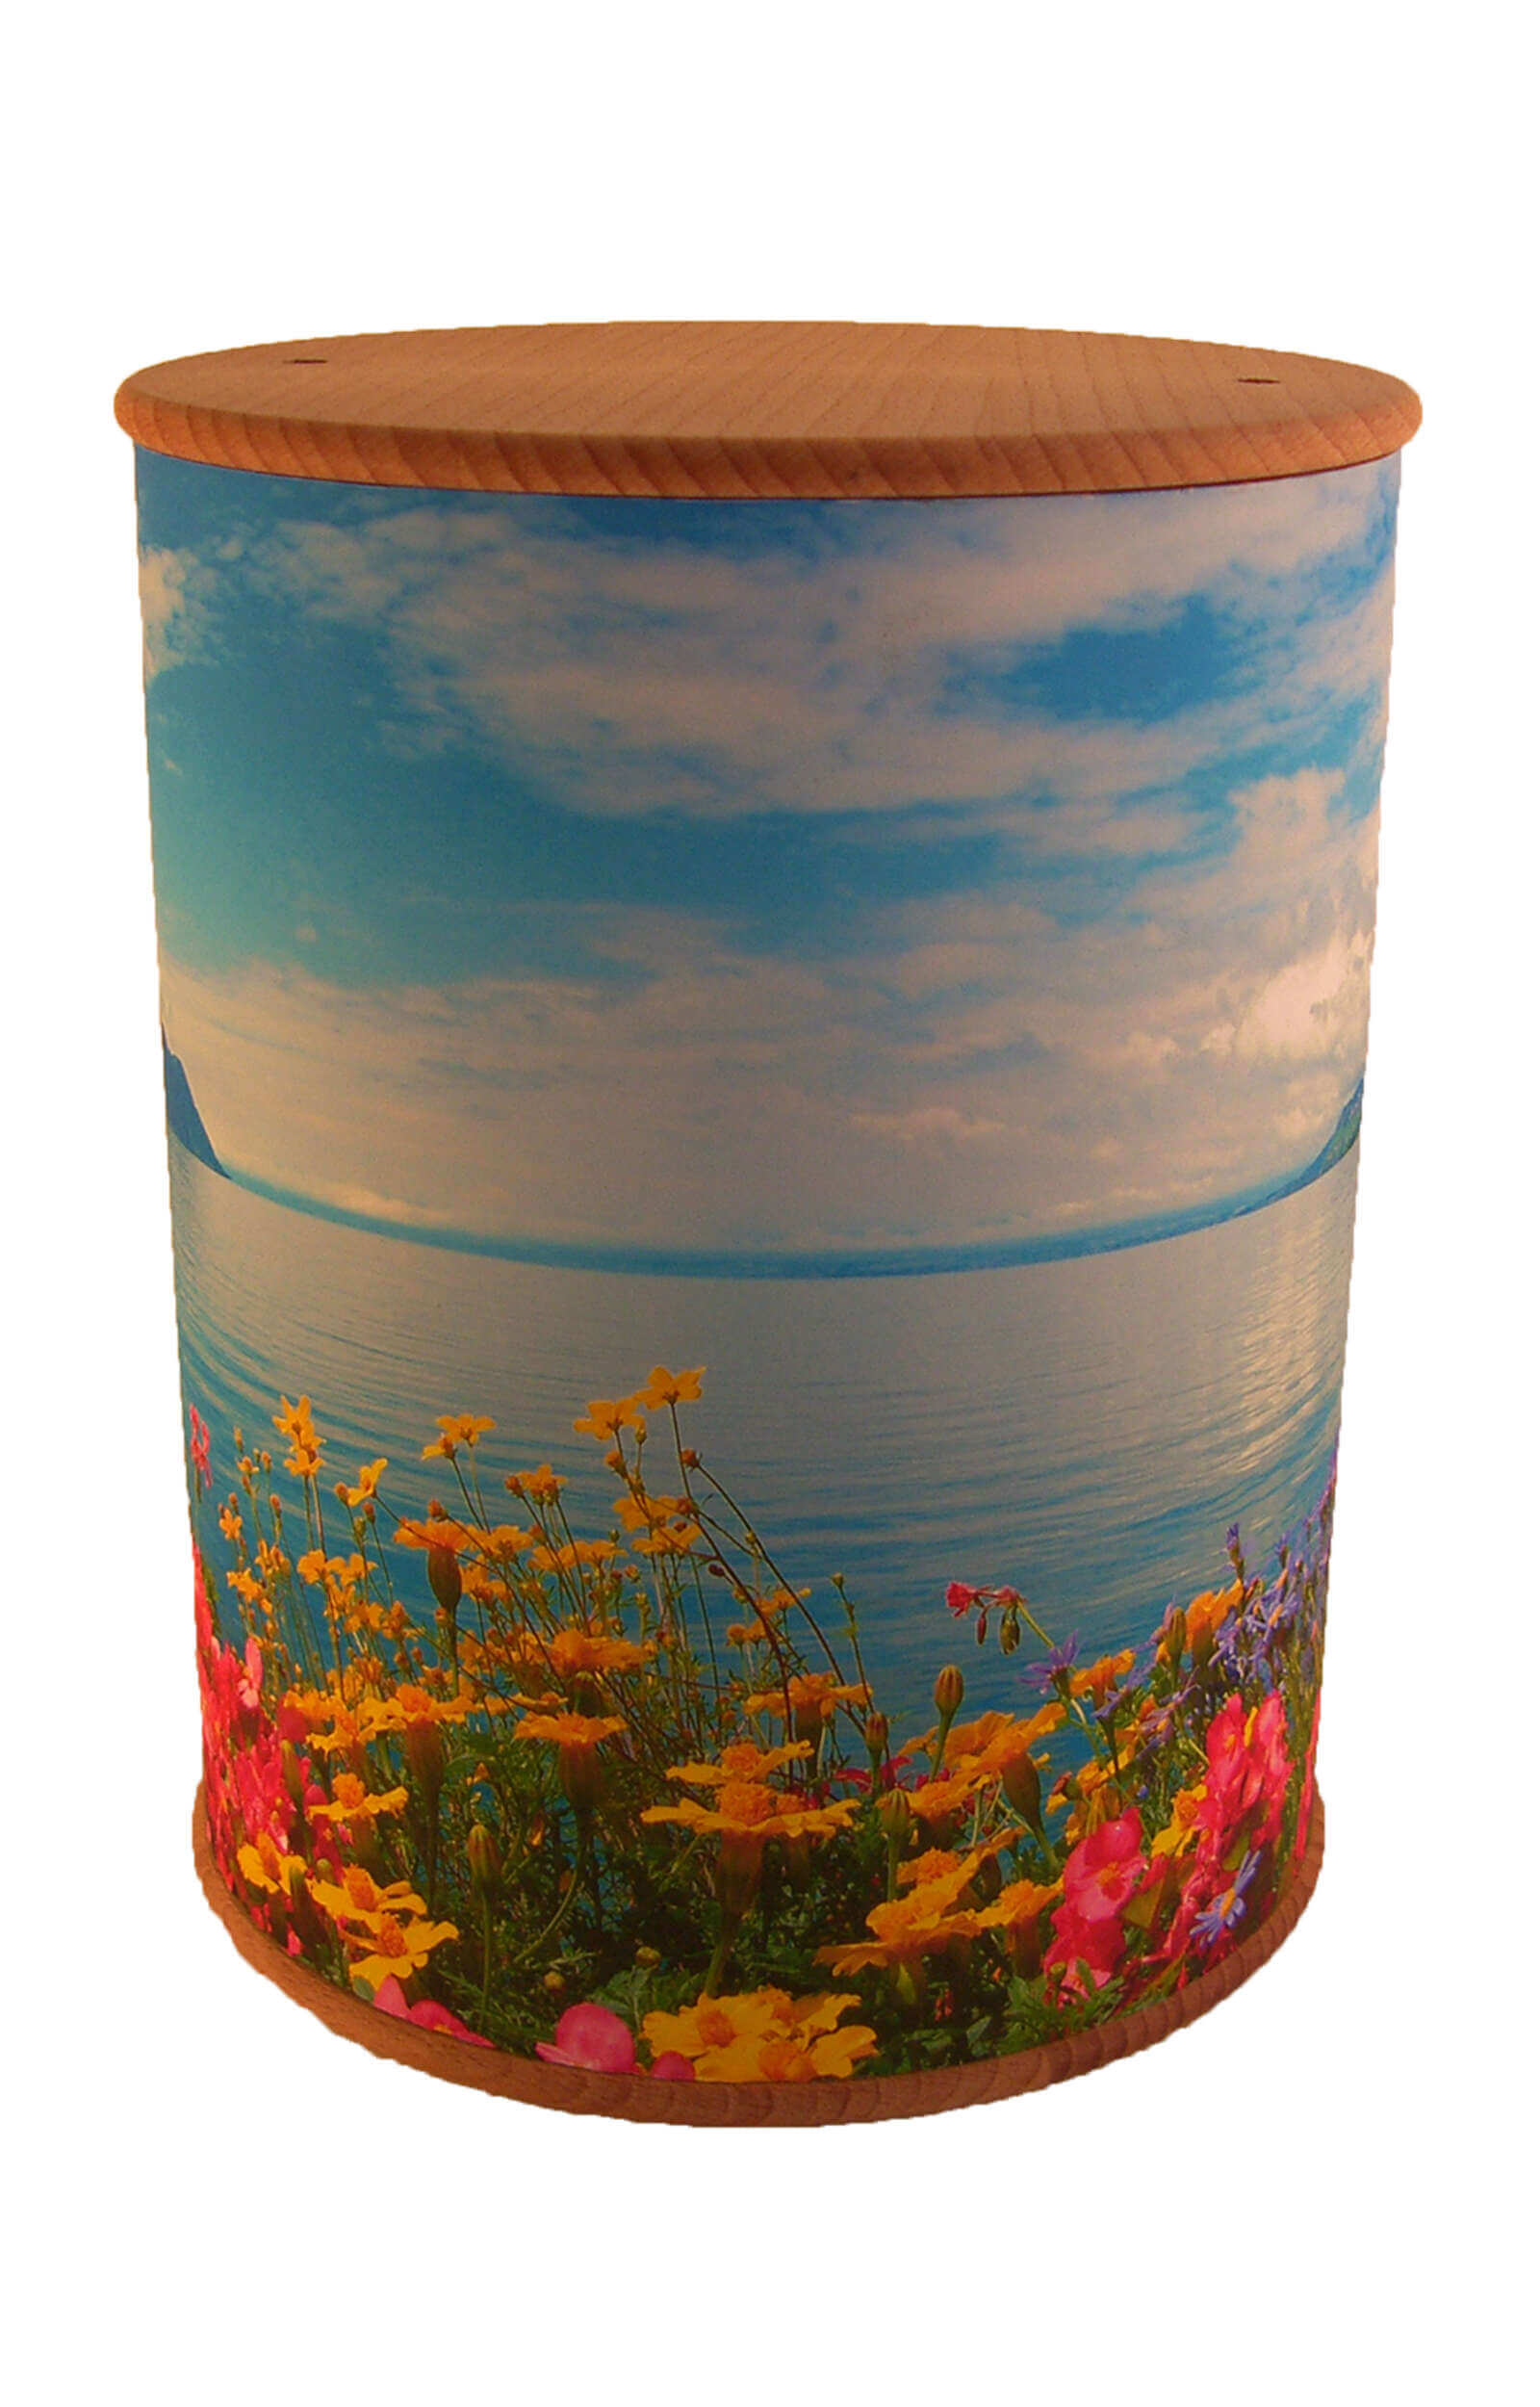 en ZB003 photo urn flowers lake blue white funeral urns on sale